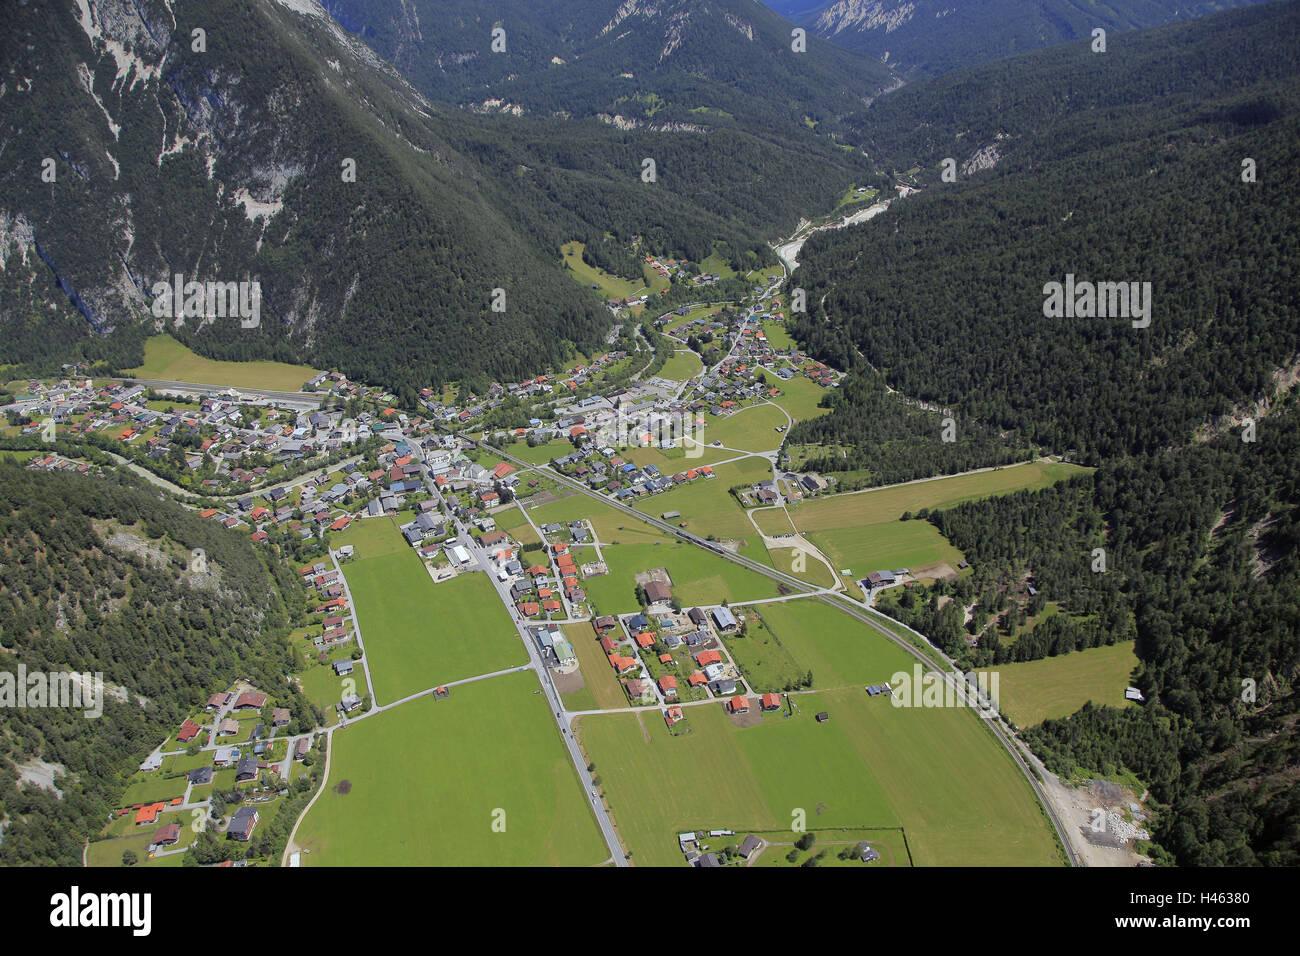 Austria, Tyrol, Scharnitz, aerial picture, alps, alp room, Karwendel, Nordtirol, place, village, parish, border - Stock Image